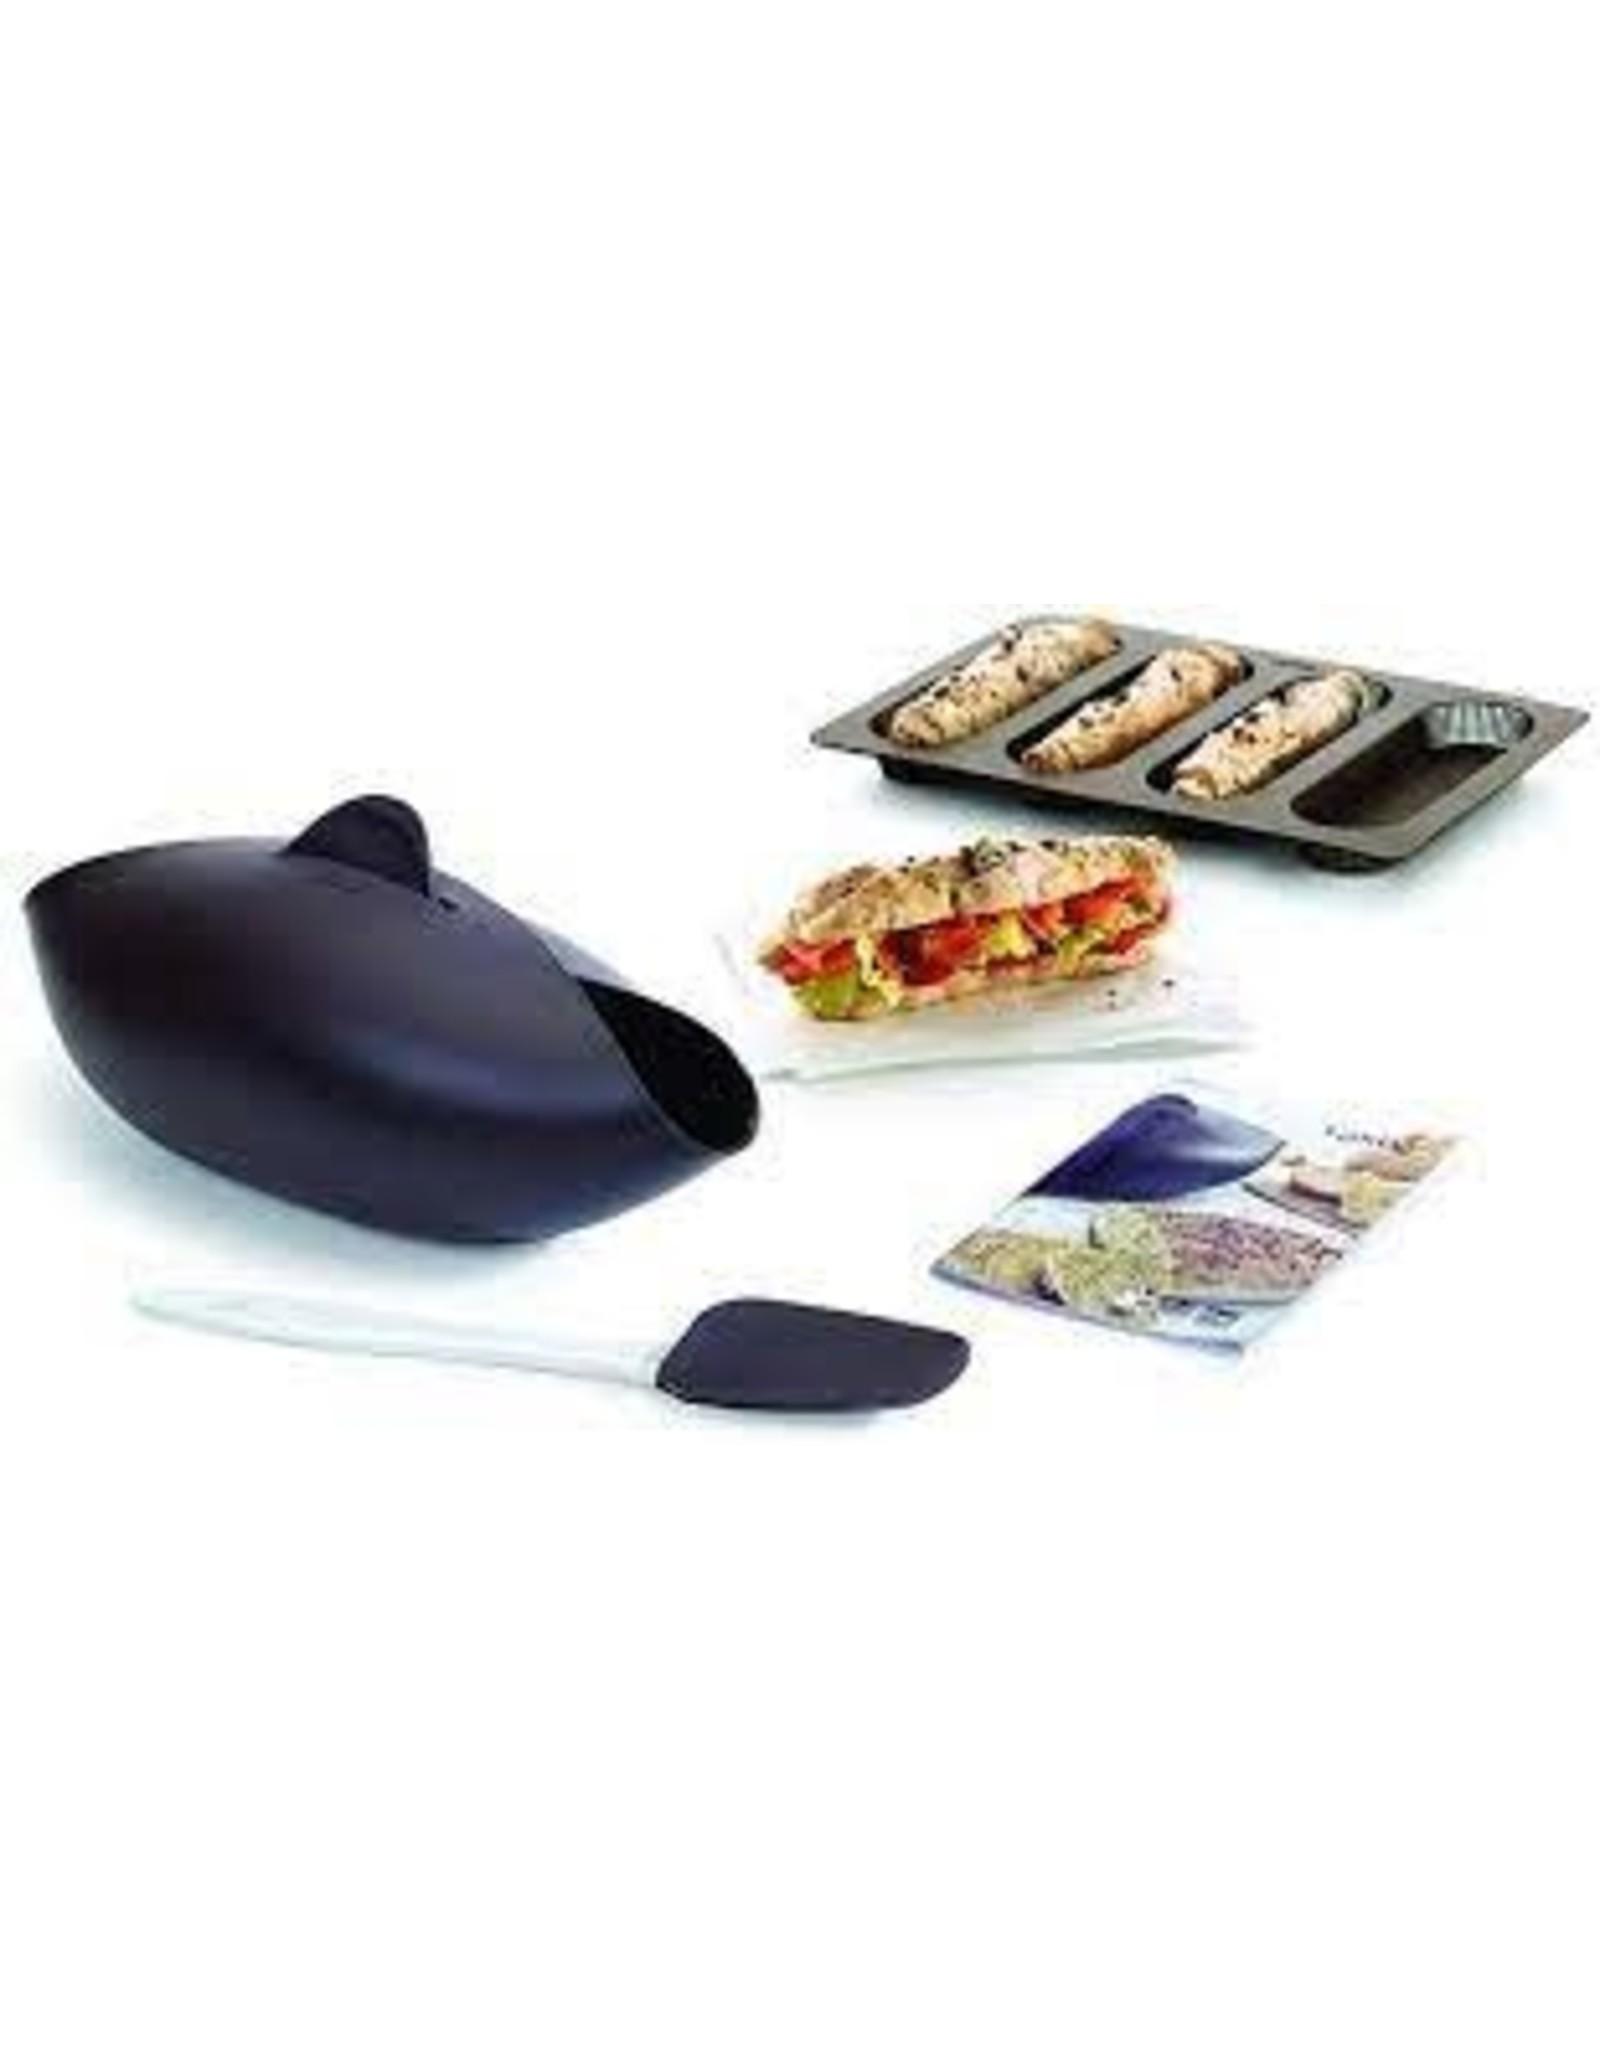 Lekue Lekue Bread Starter Kit